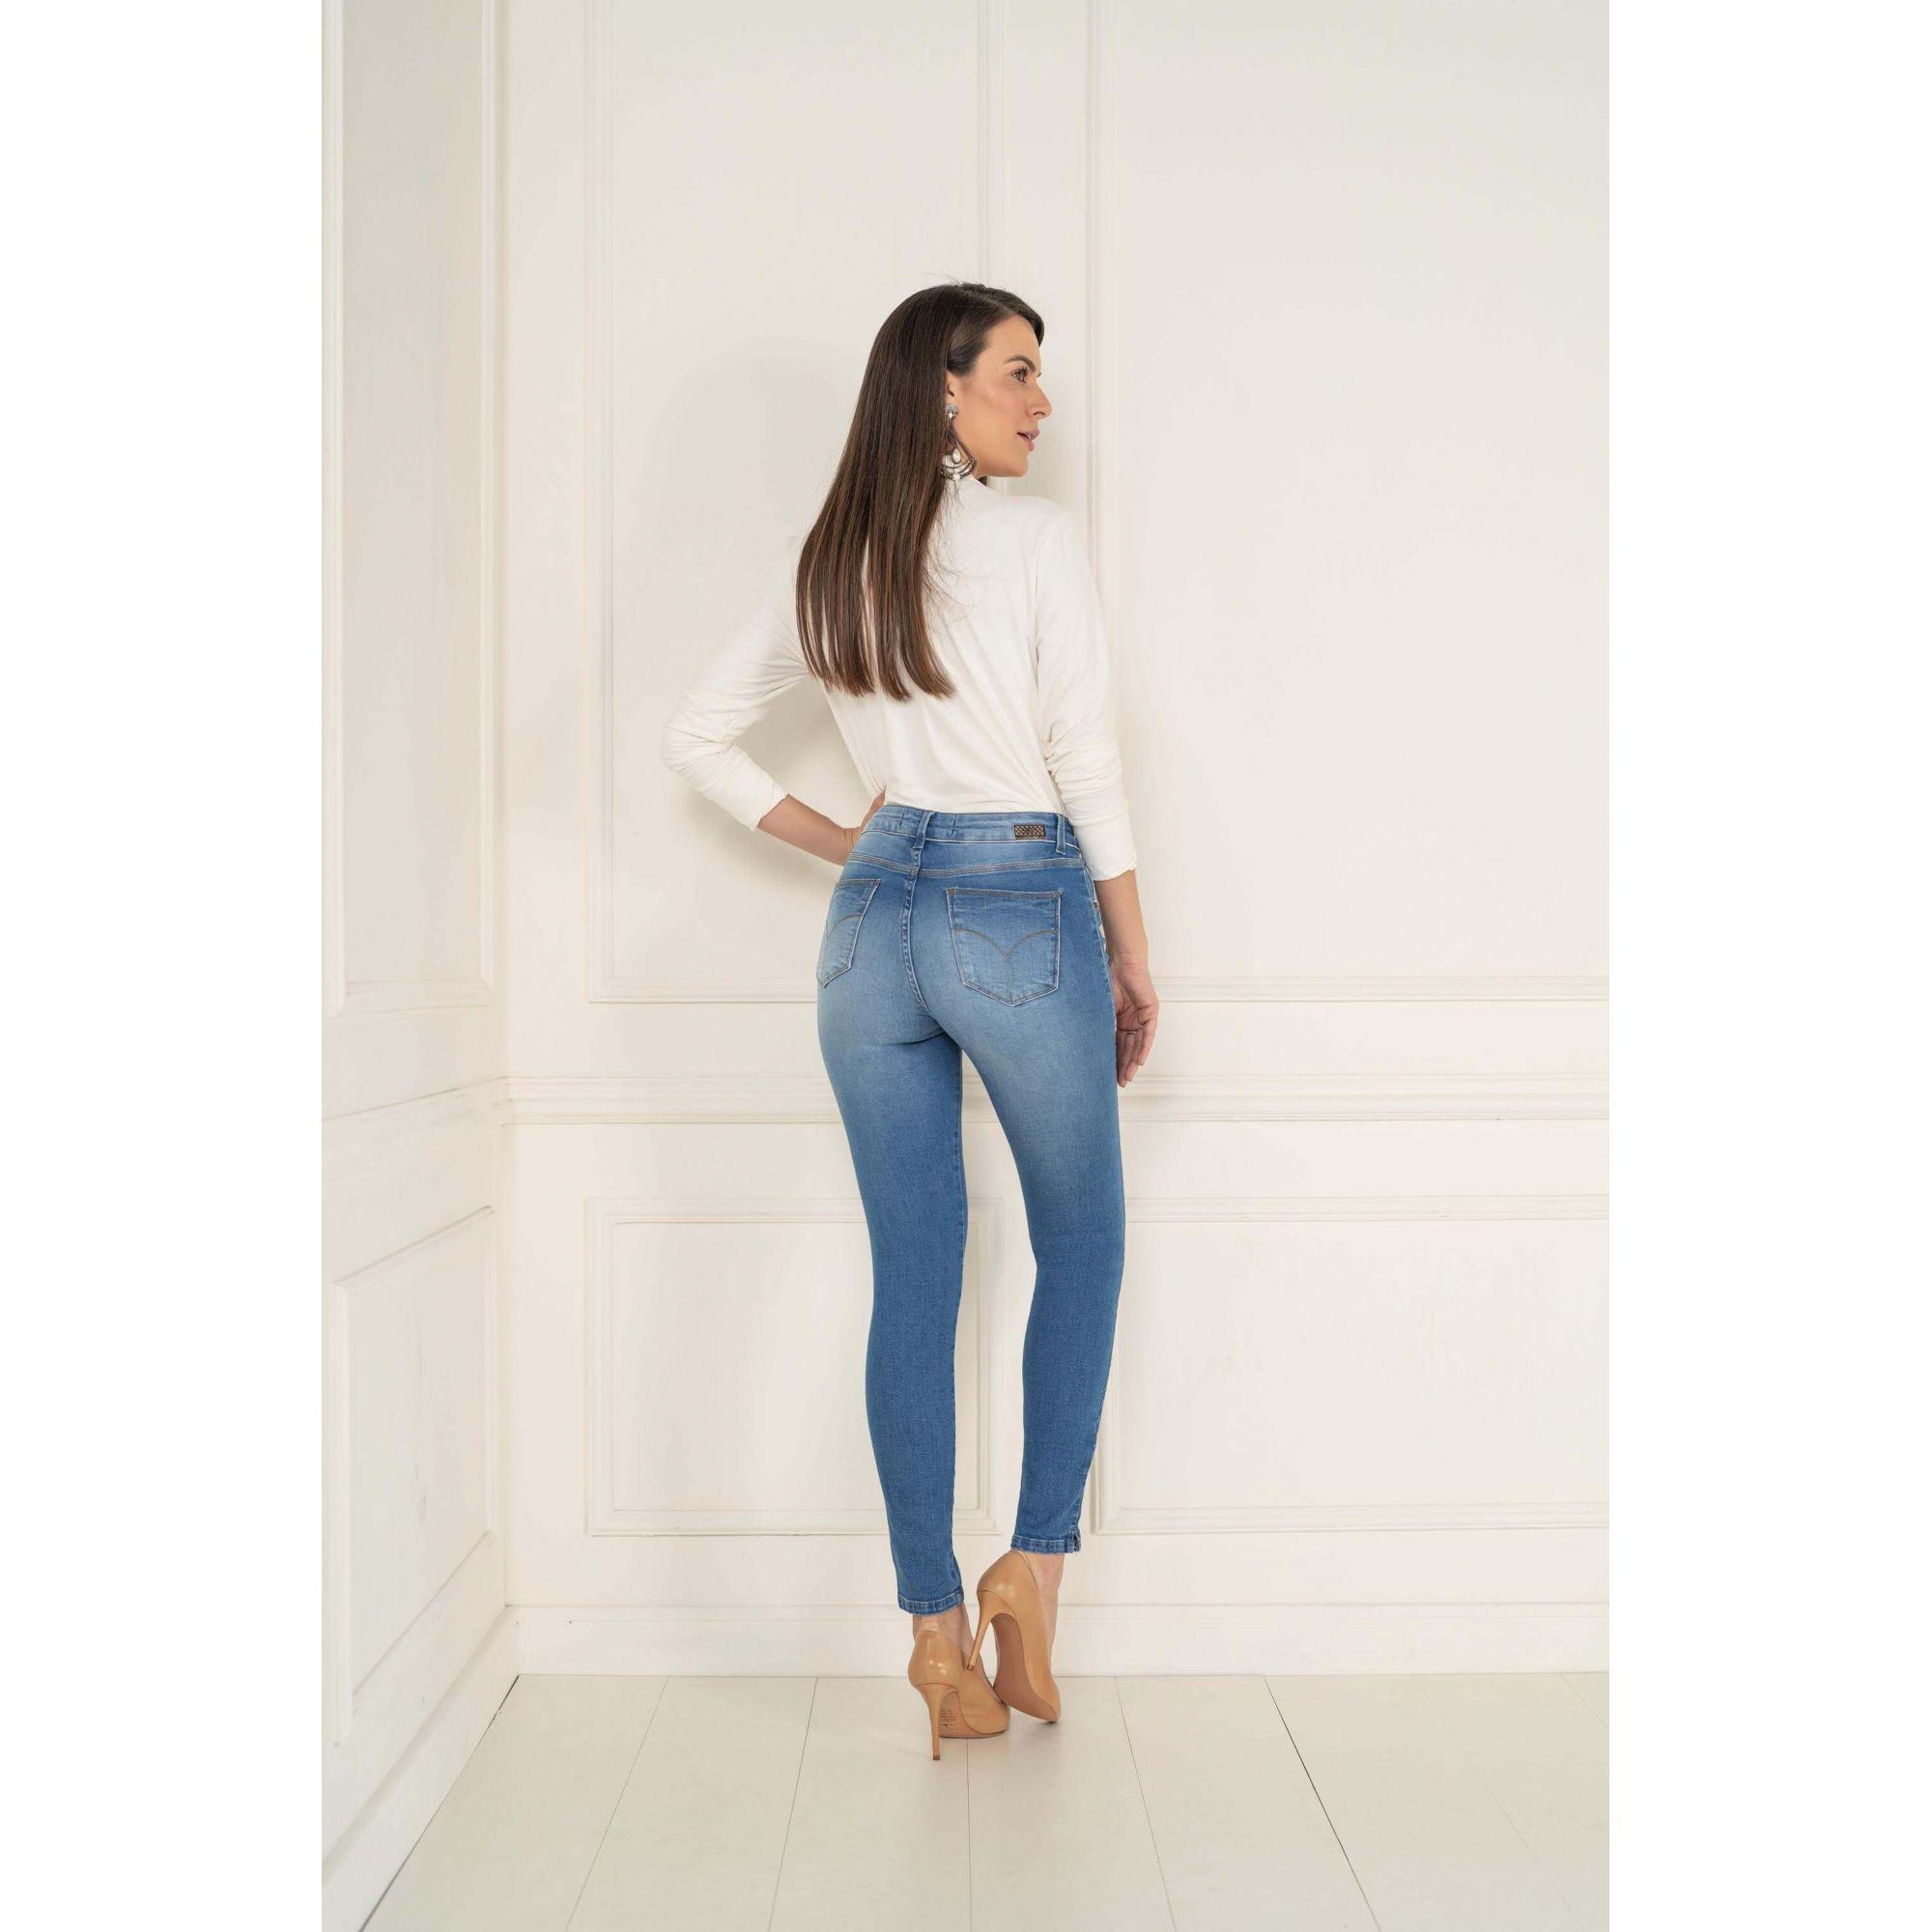 Calça Jegging Chapa Barriga Lycra Jeans - KACOLAKO